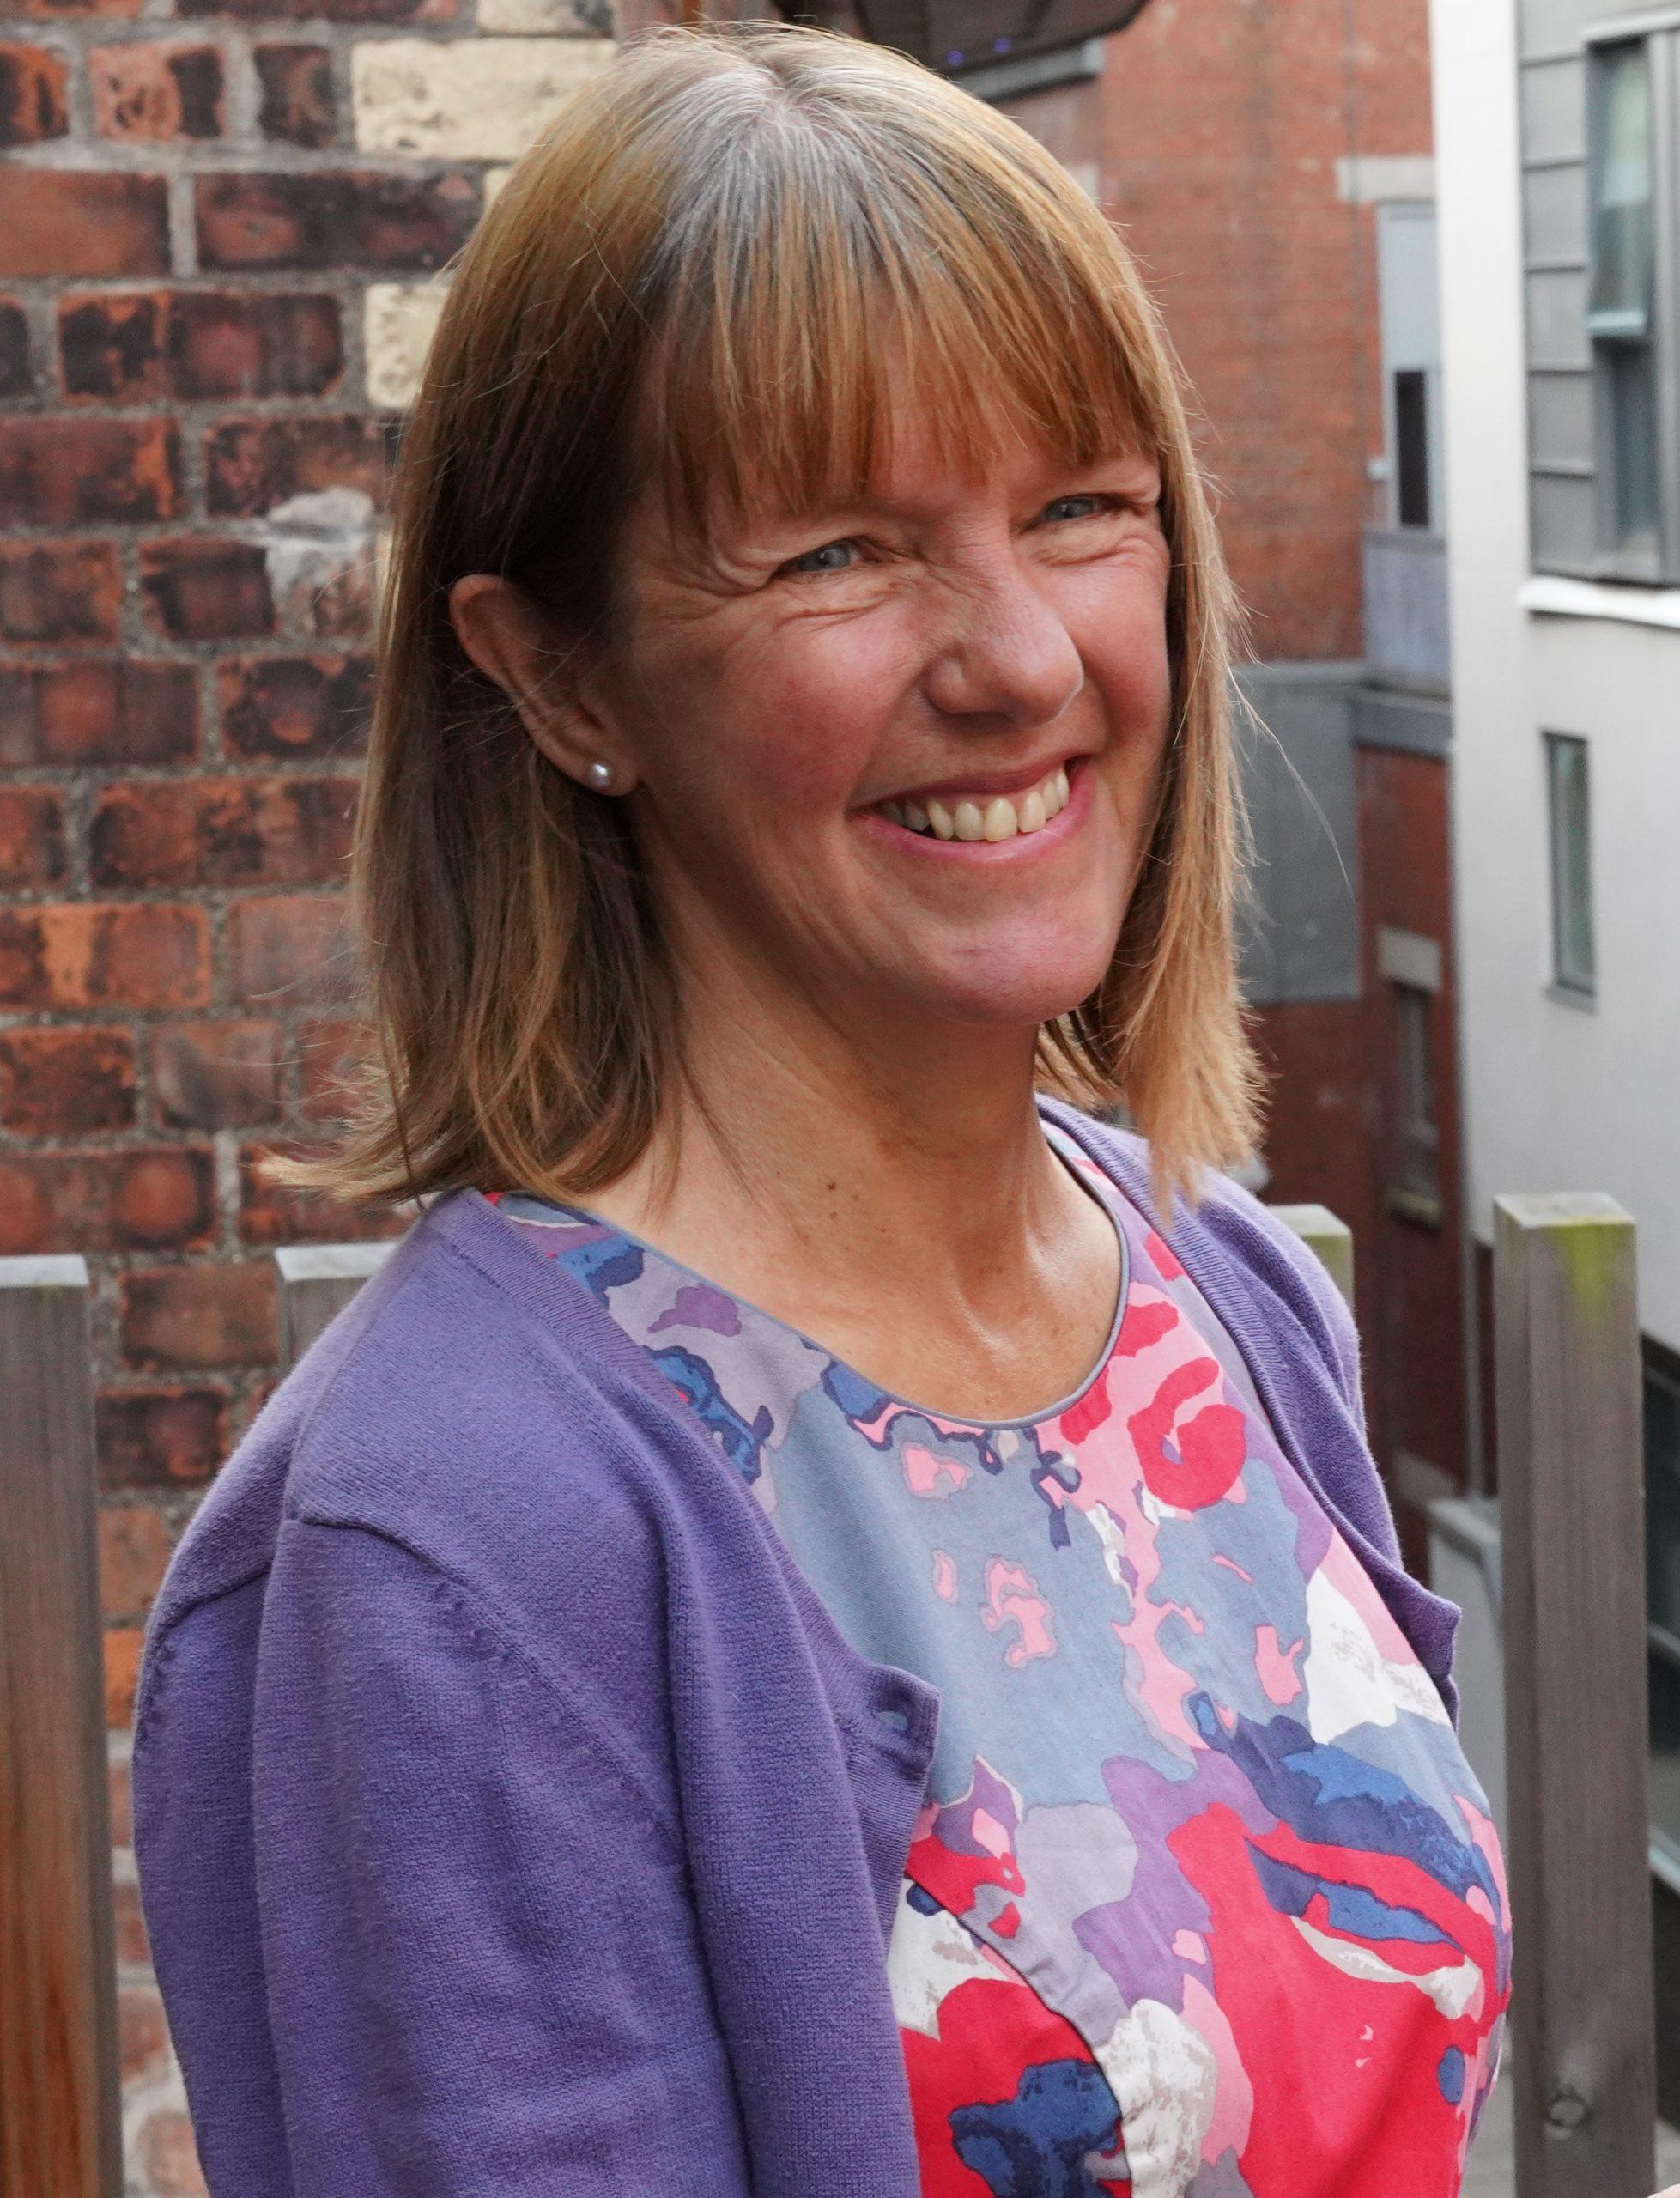 Makar, Kathleen Jamie standing on the balcony at Scottish Poetry Library